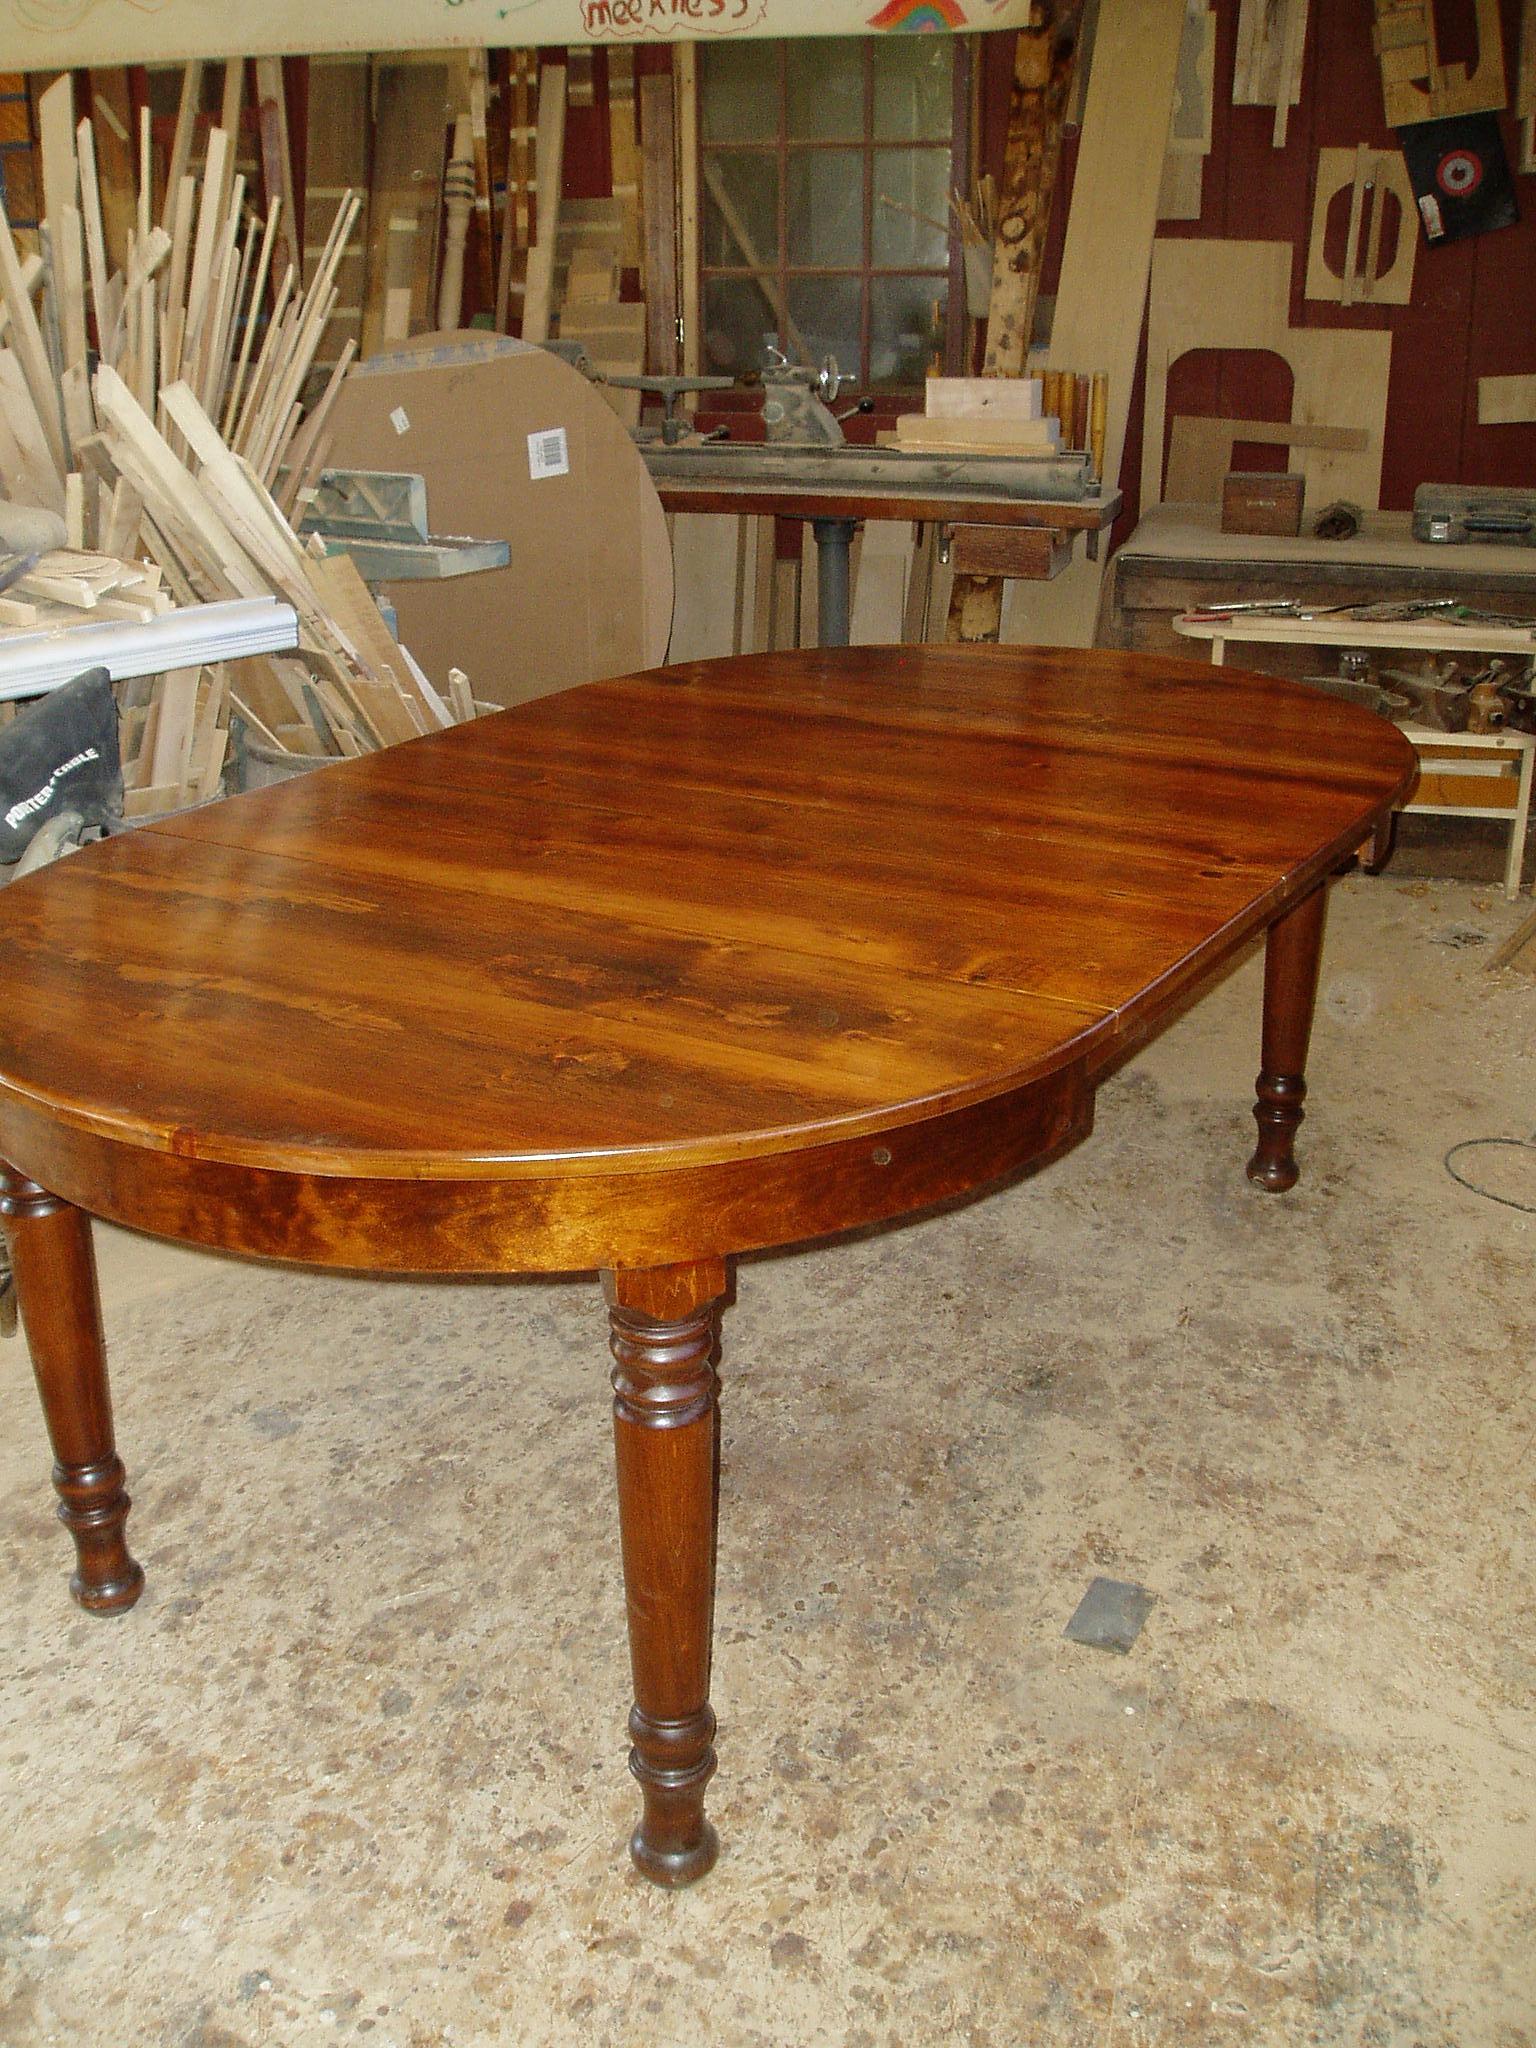 Handmade Farm Tables New England Joinery Reclaimed